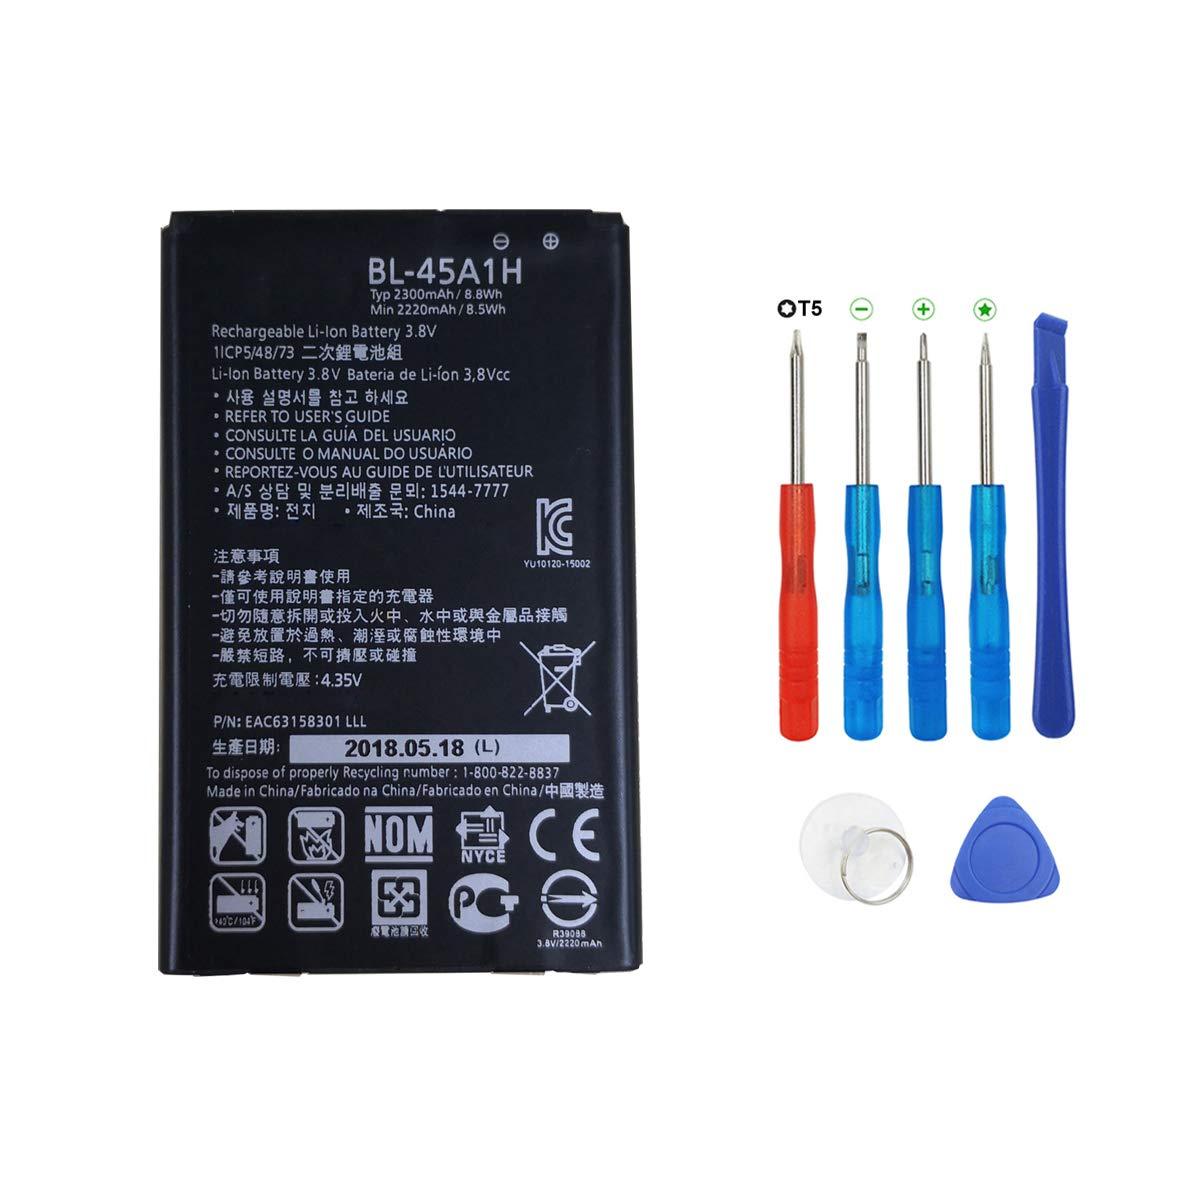 Bateria Celular Swark BL 45A1H Compatible con LG K10 LTE F670L F670K F670S Q10 K420N + Herramientas